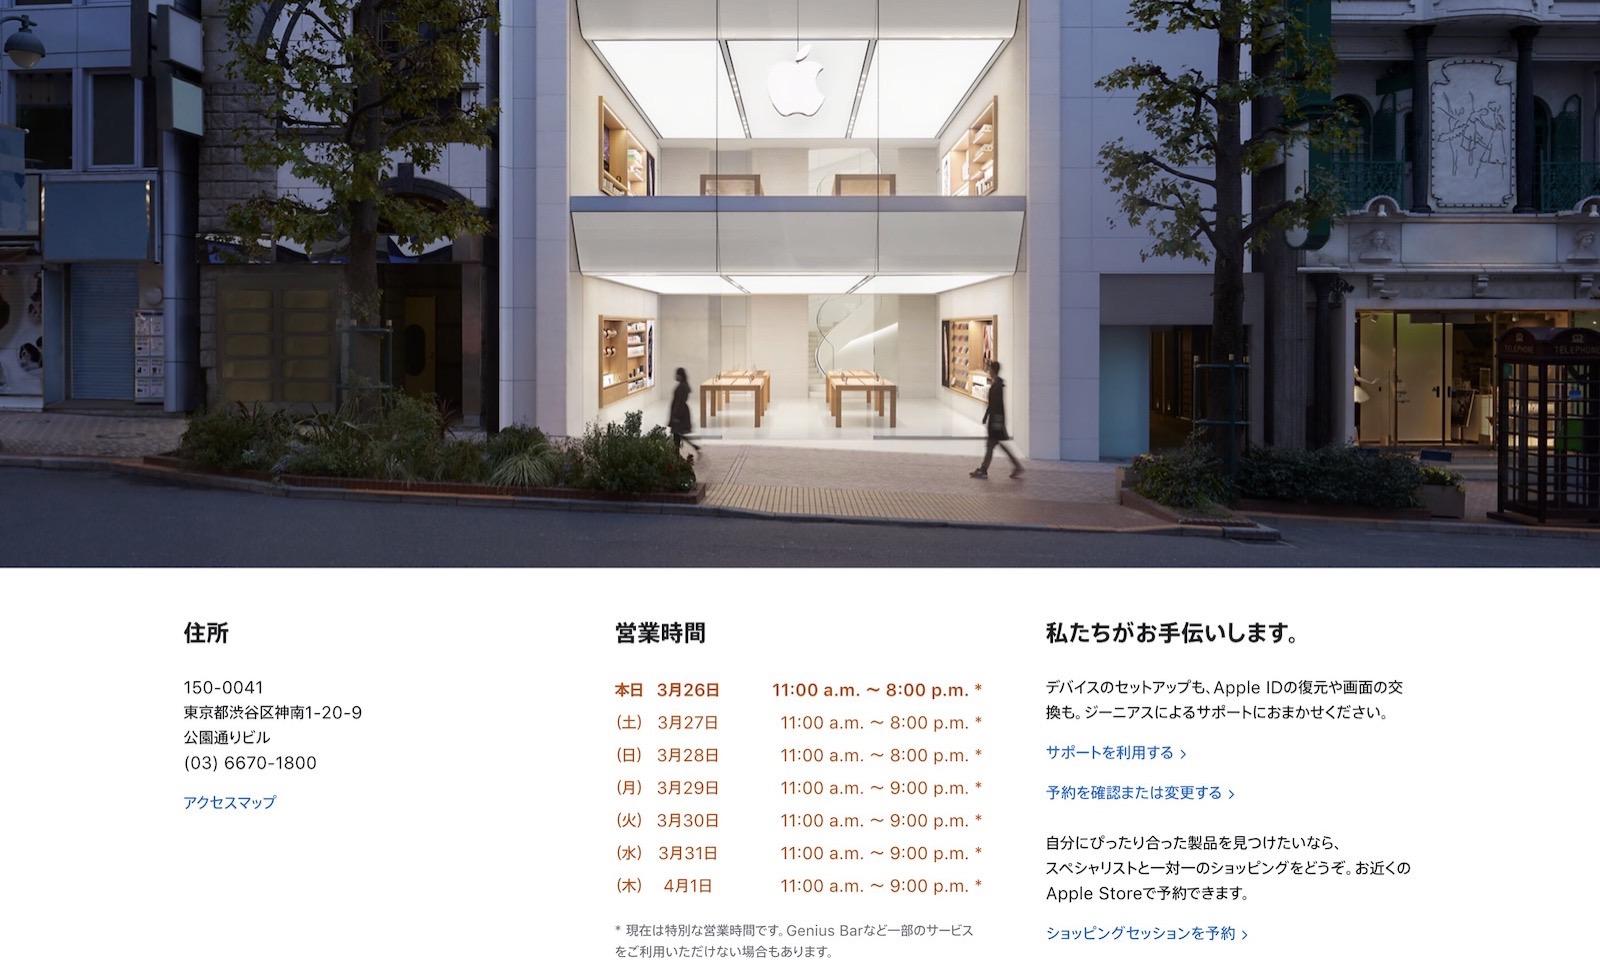 Apple store shibuya